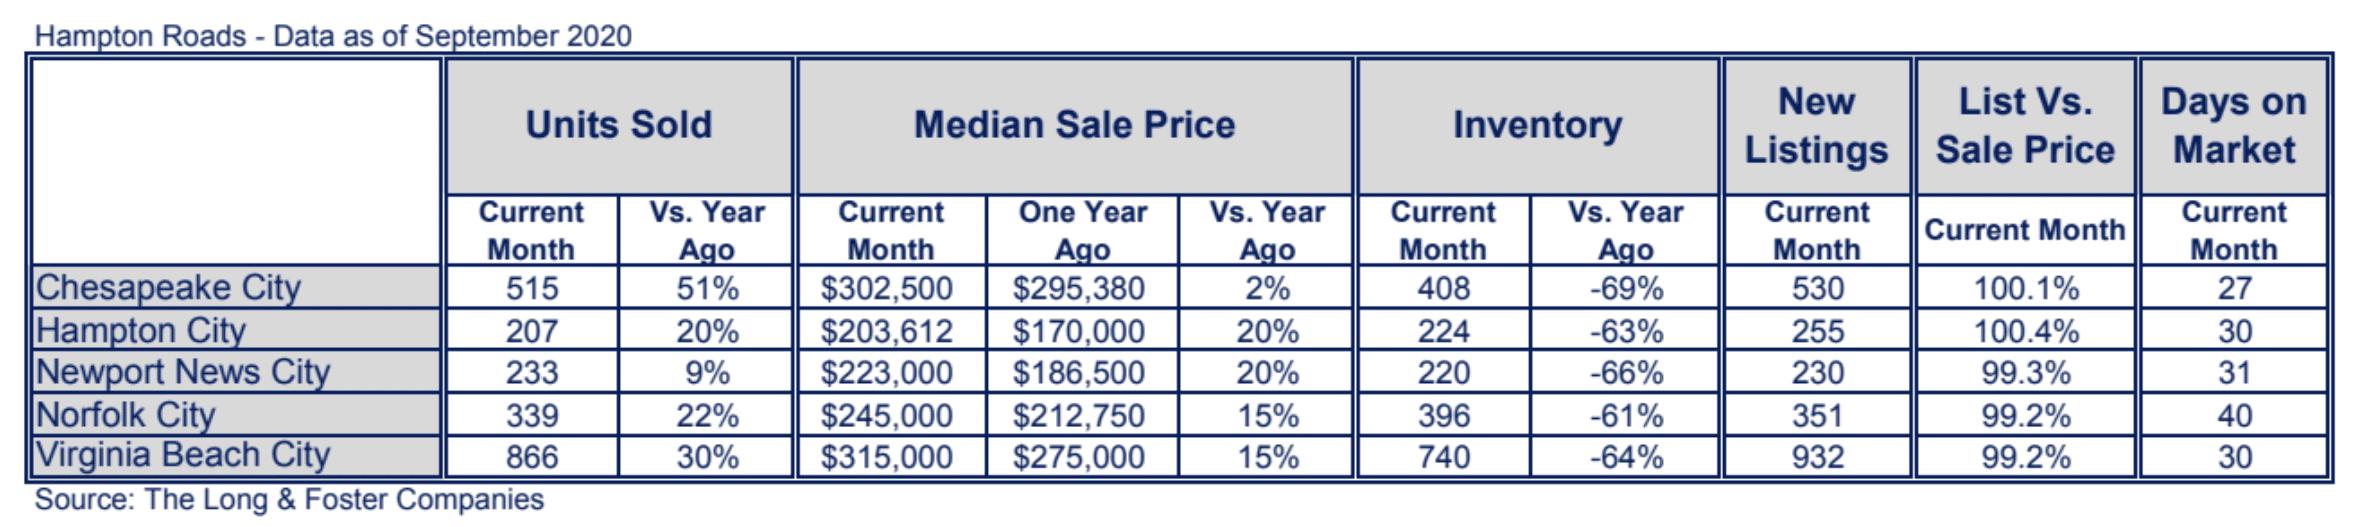 Hampton Roads Market Minute Chart September 2020